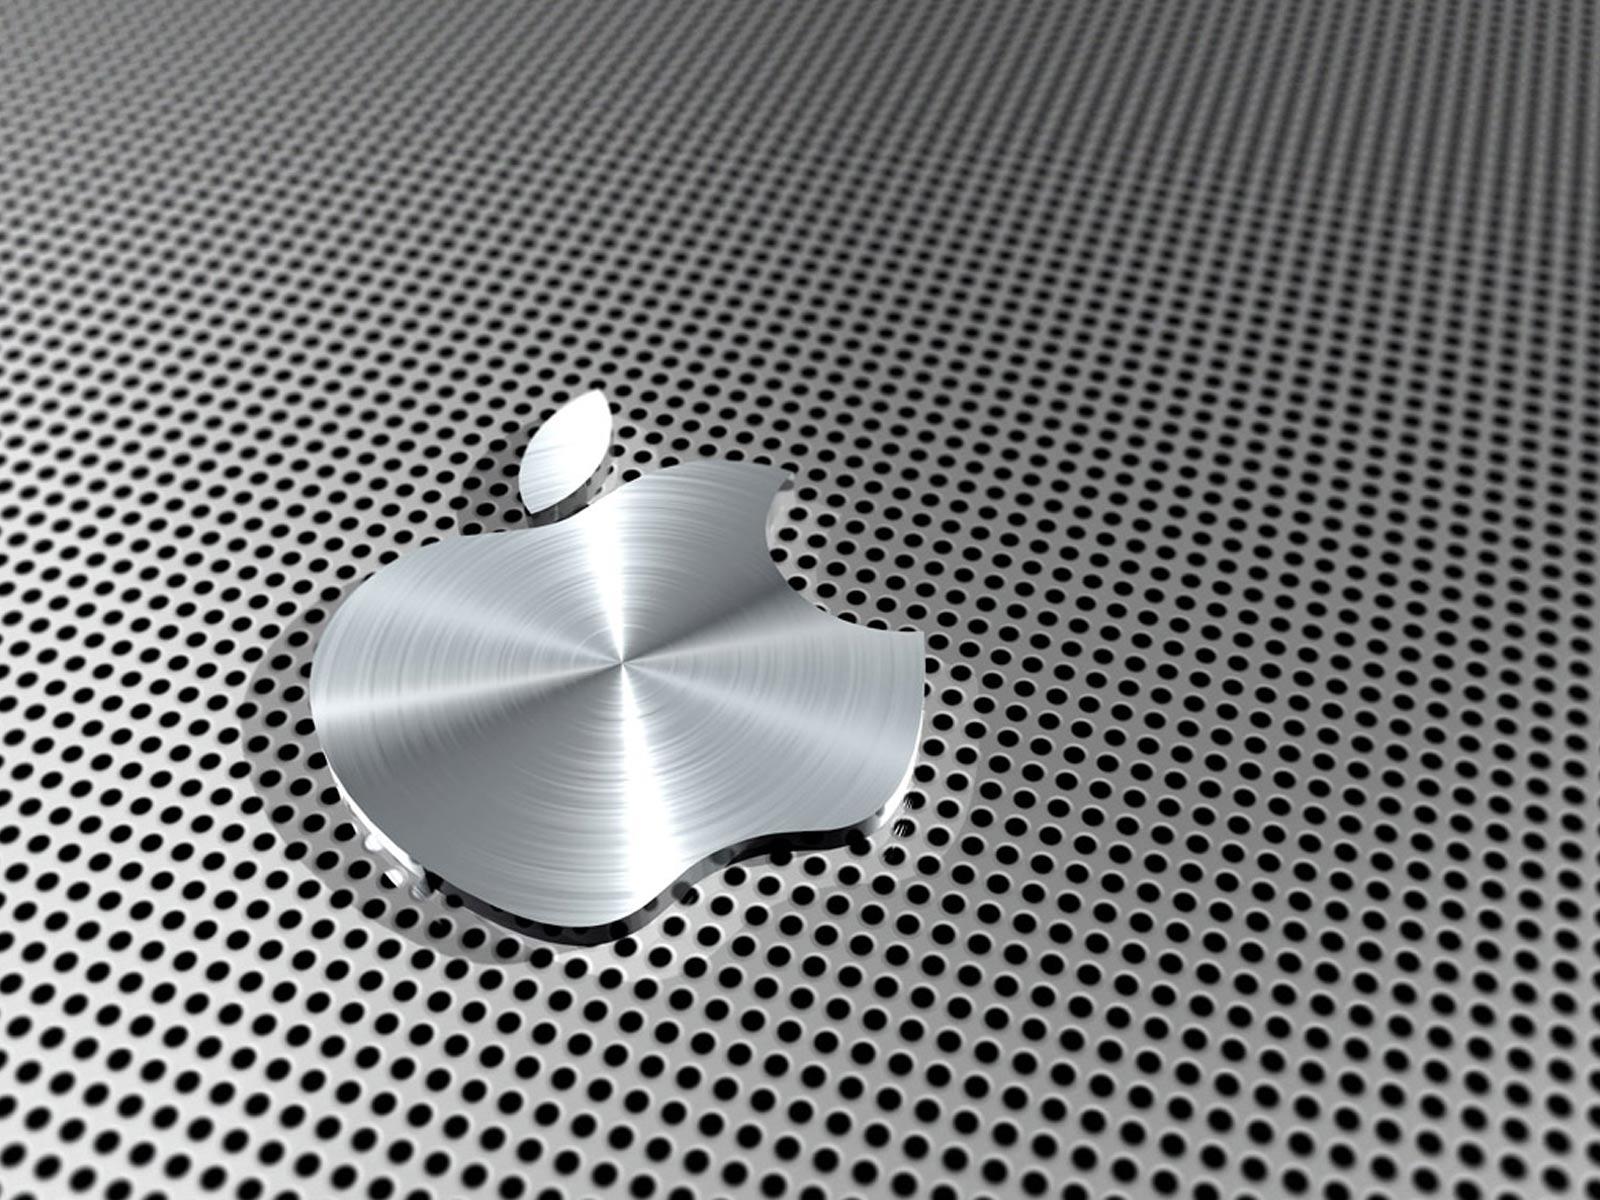 Apple aluminum texture background download aluminum texture 1600x1200